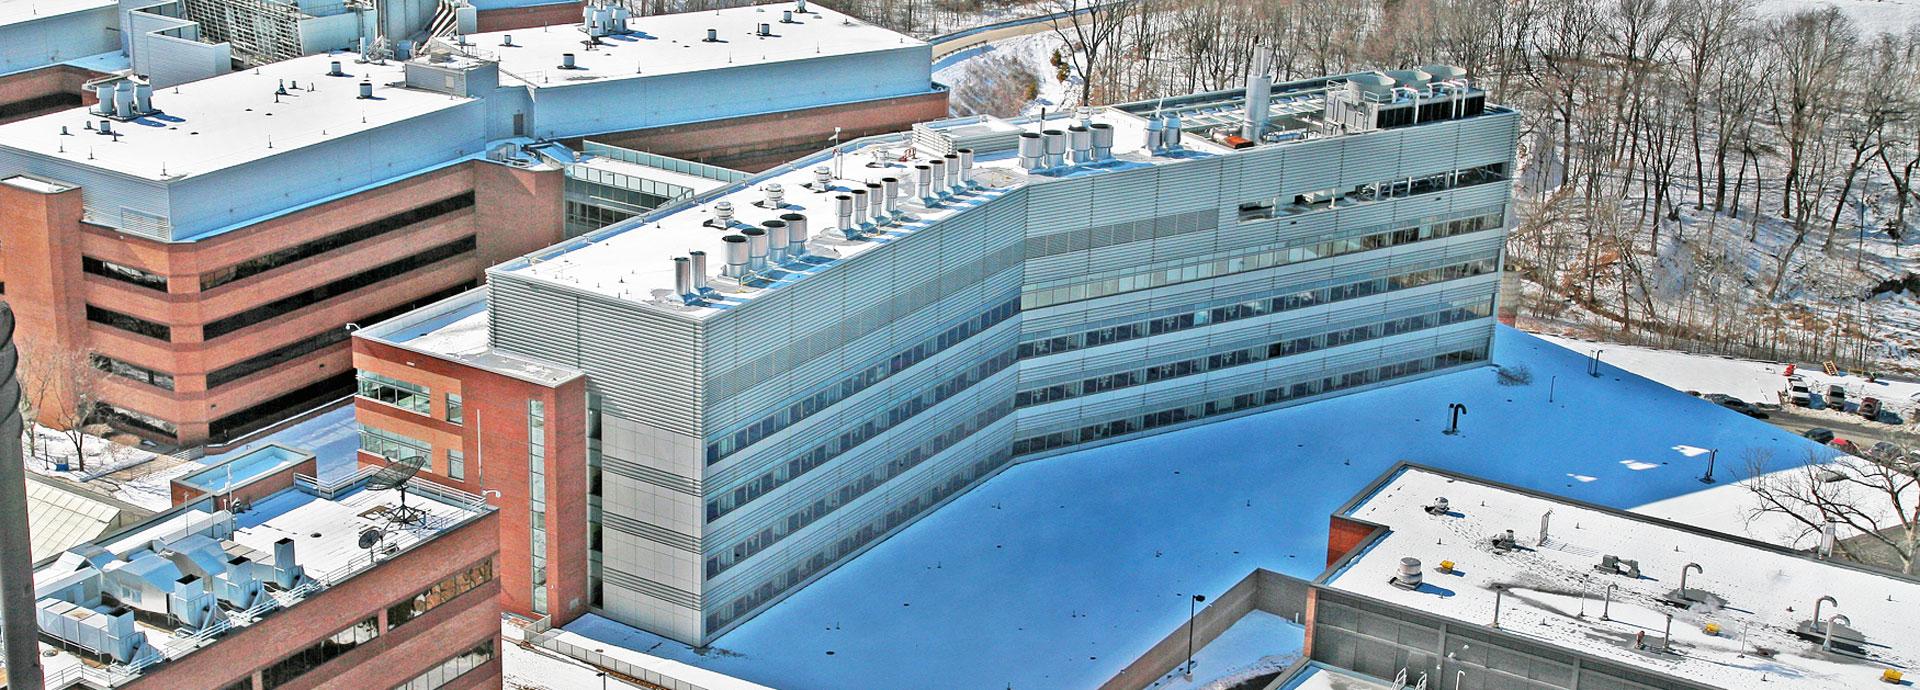 Pfizer New Research Building Cc Tarlton